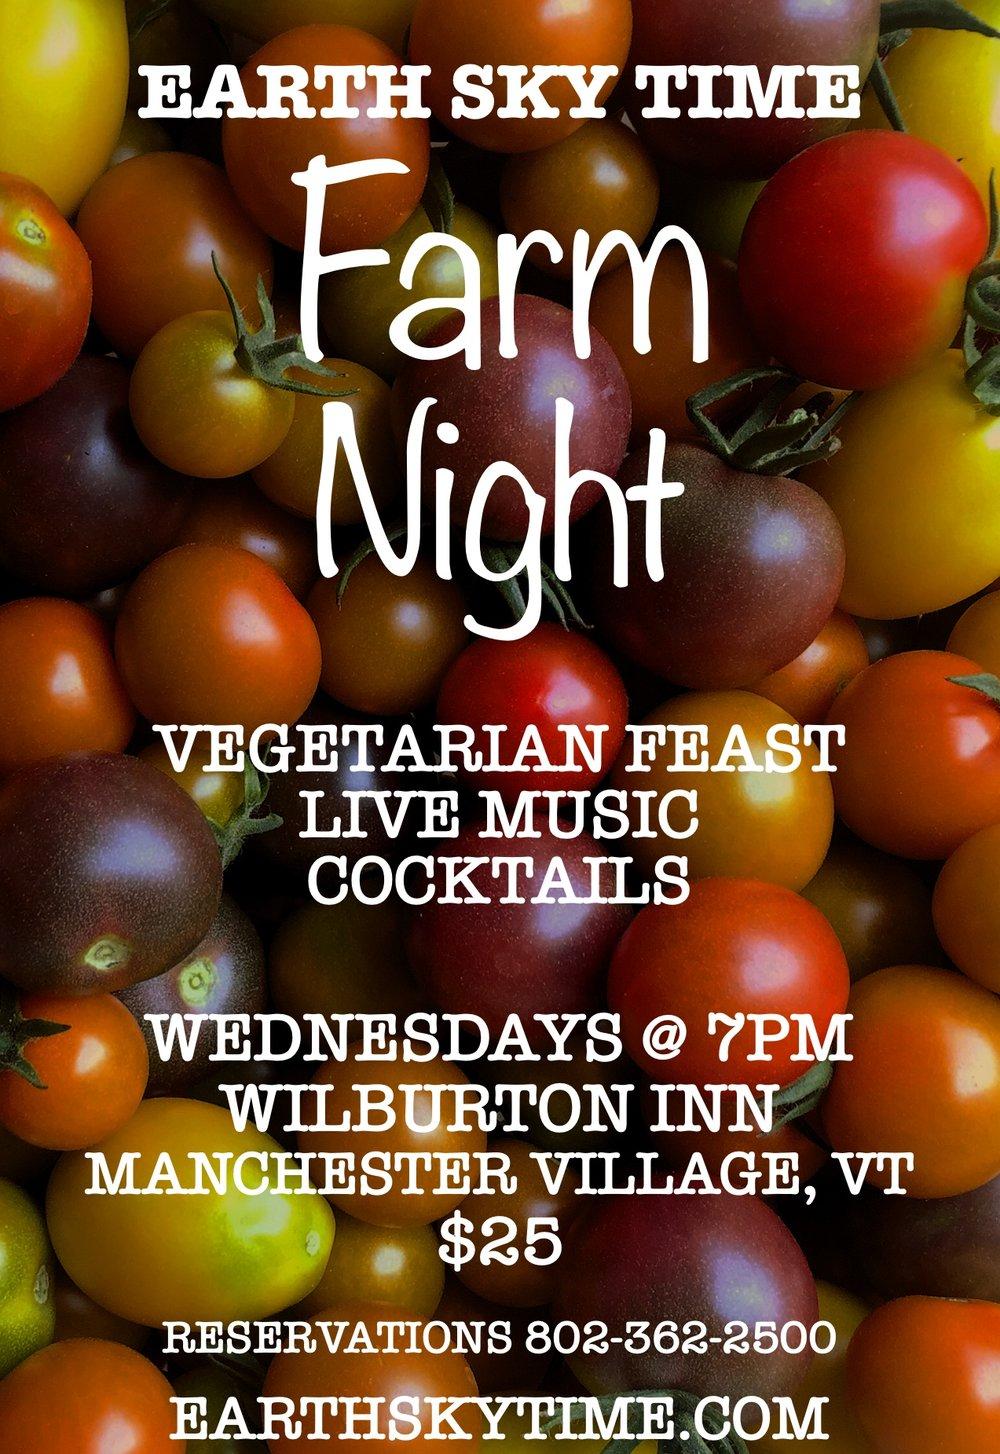 1 Farm night poster Oliver.jpg